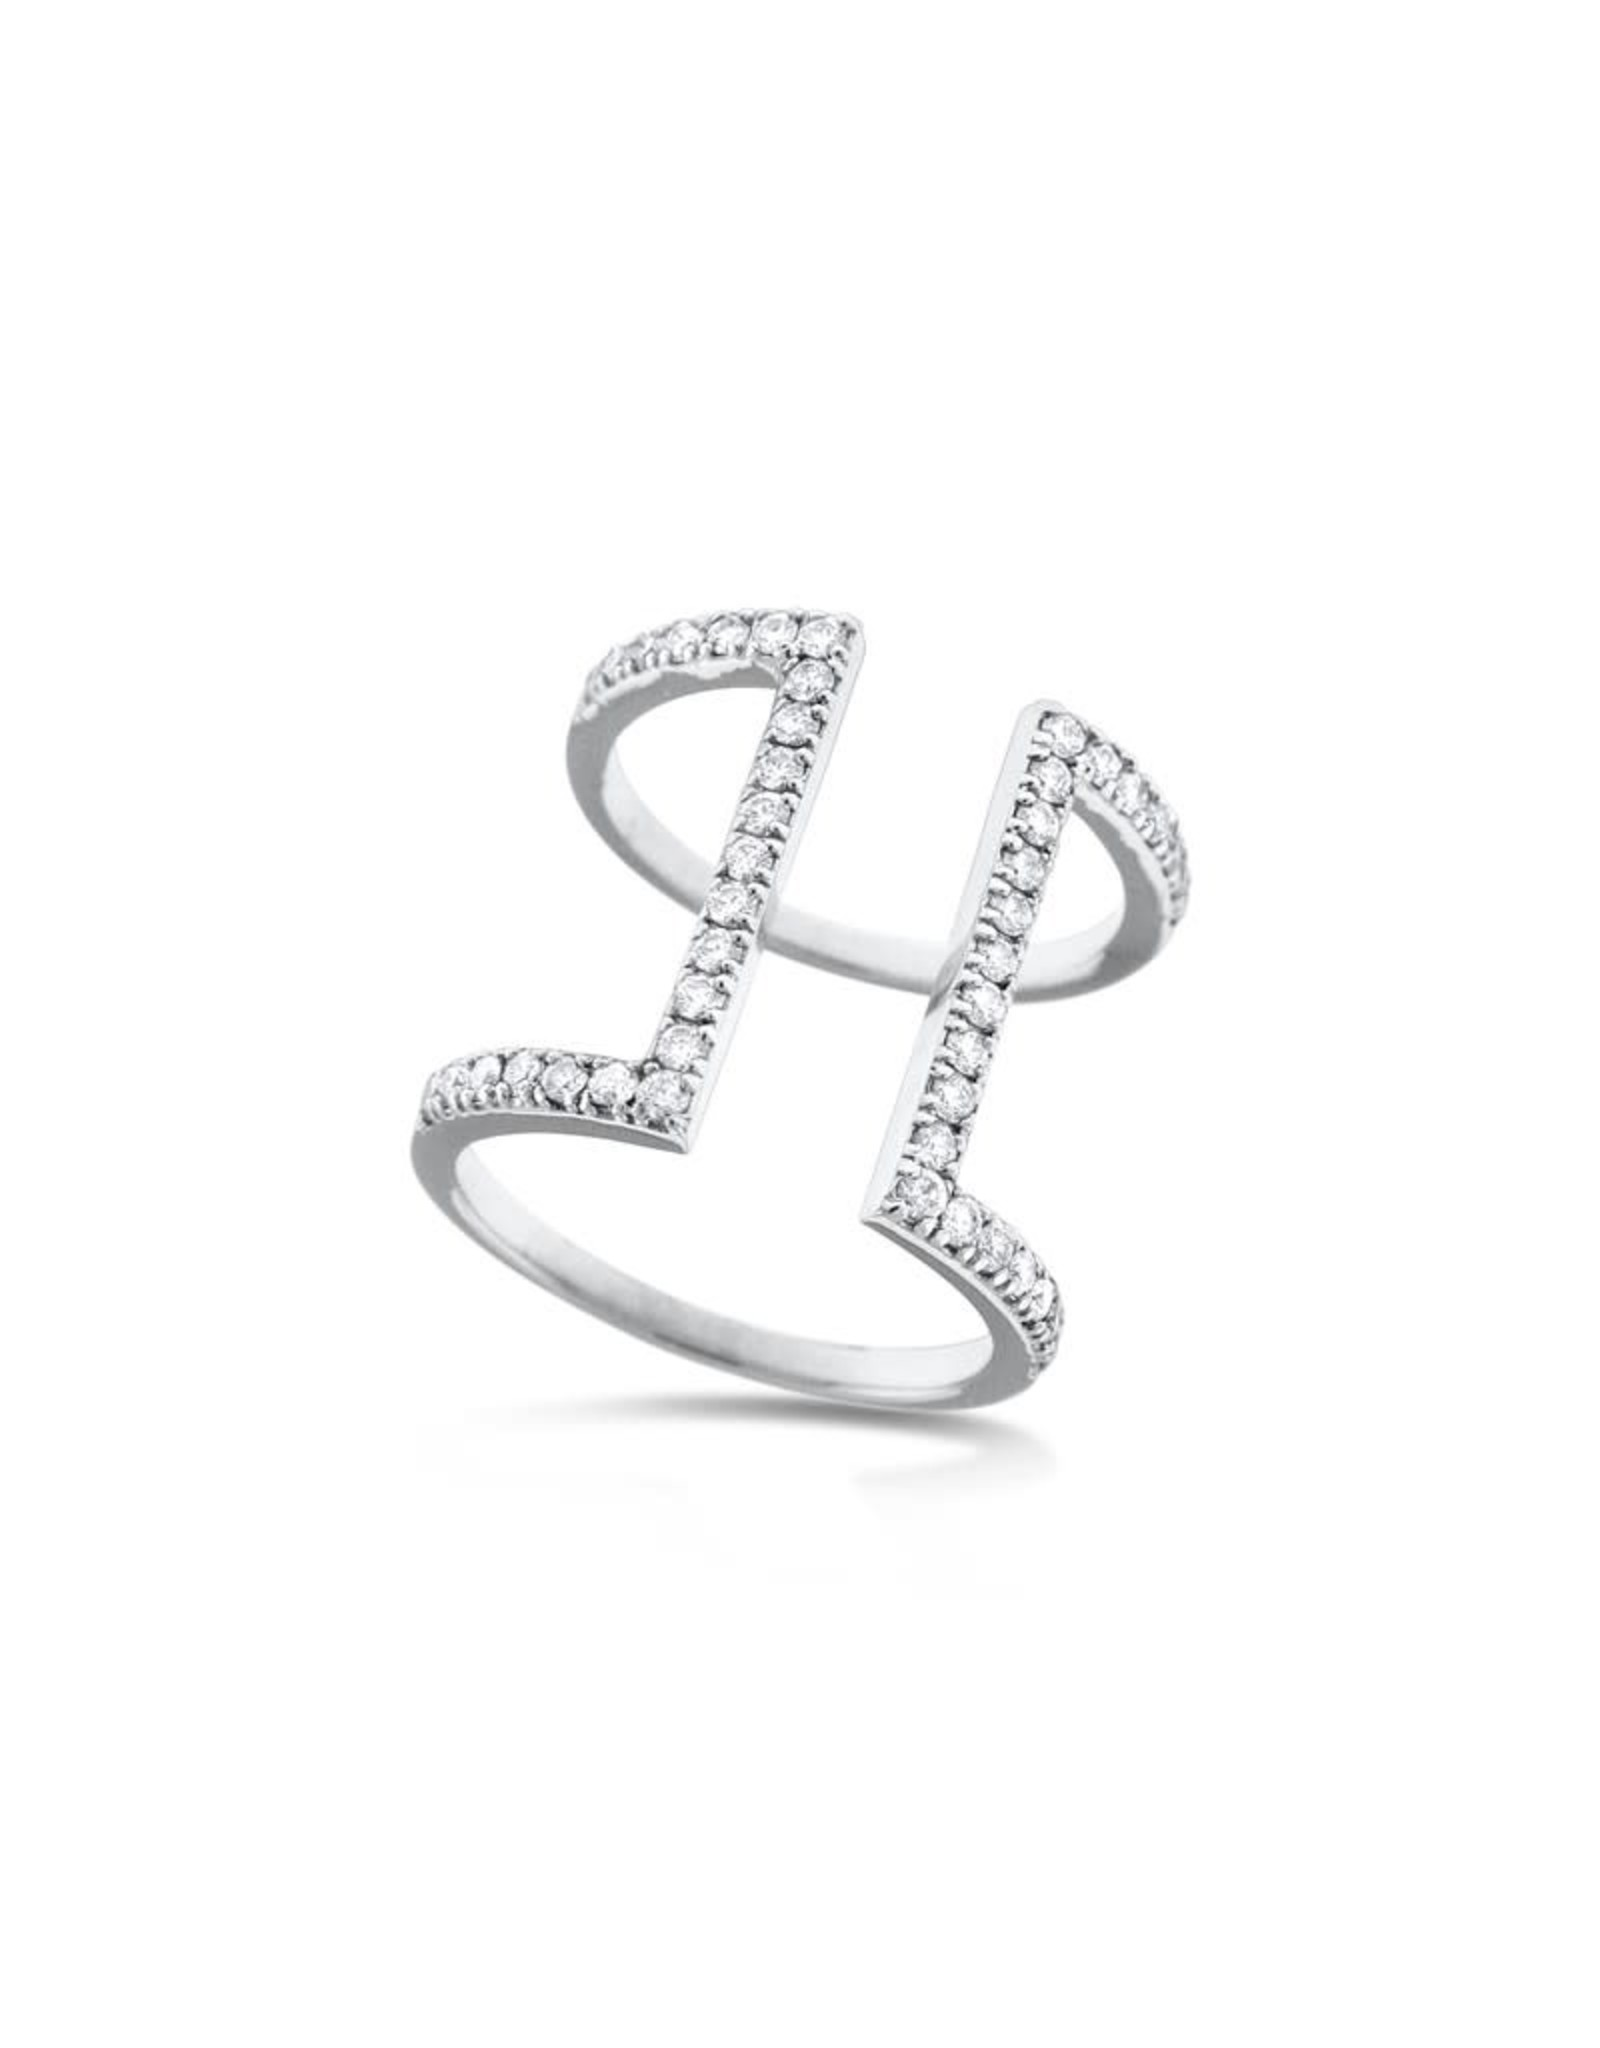 14K White Gold Wide Modern Geometric Diamond Bar Ring, D: 0.62ct